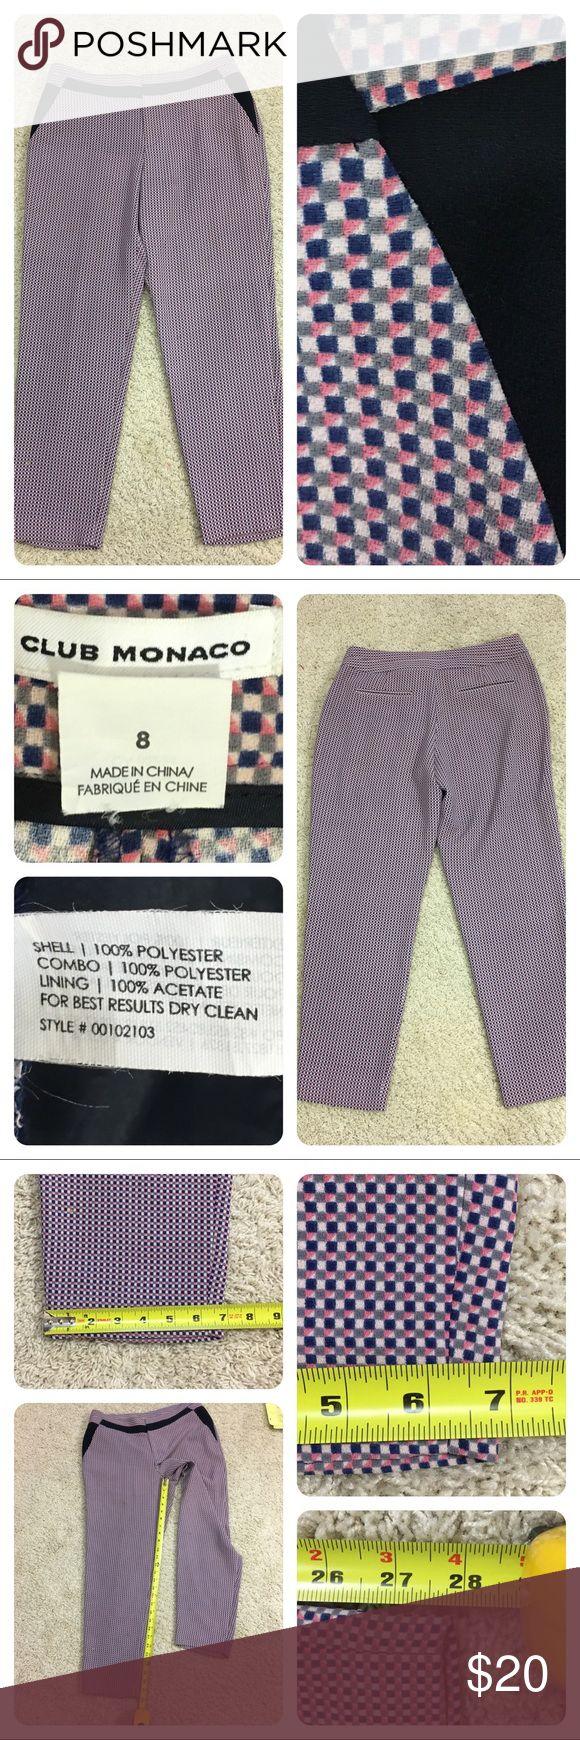 Club Monaco checked pants Fun checked pants from Club Monaco. Club Monaco Pants